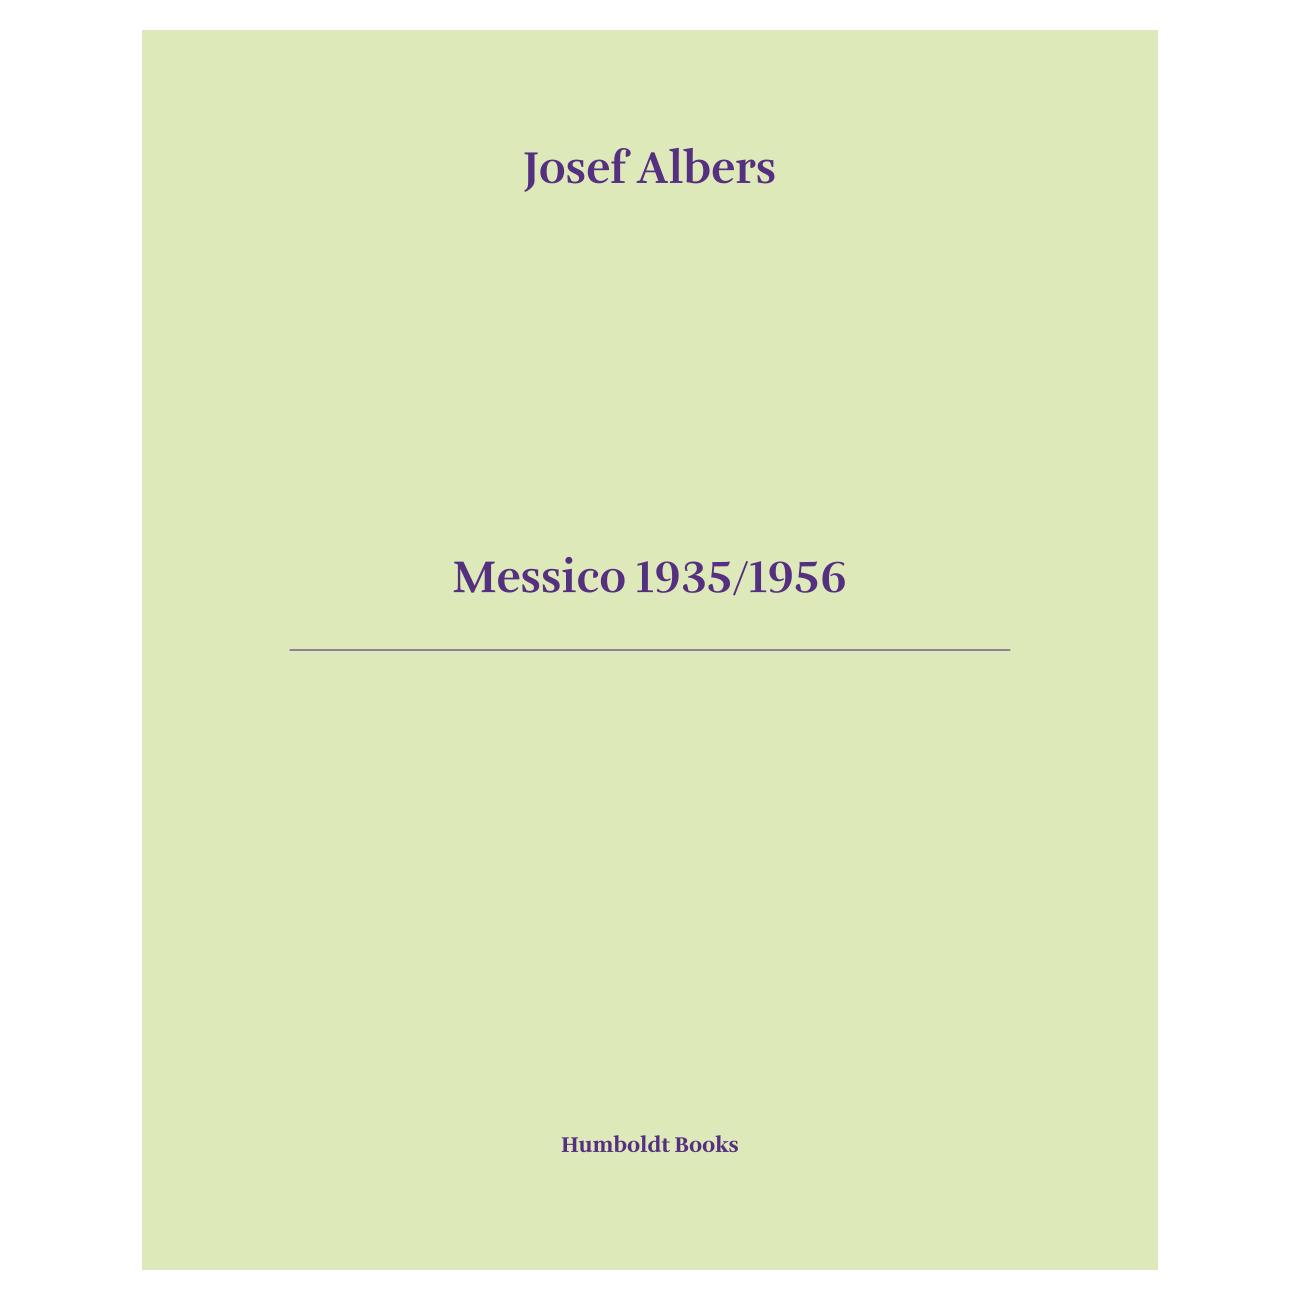 Messico 1935/1956